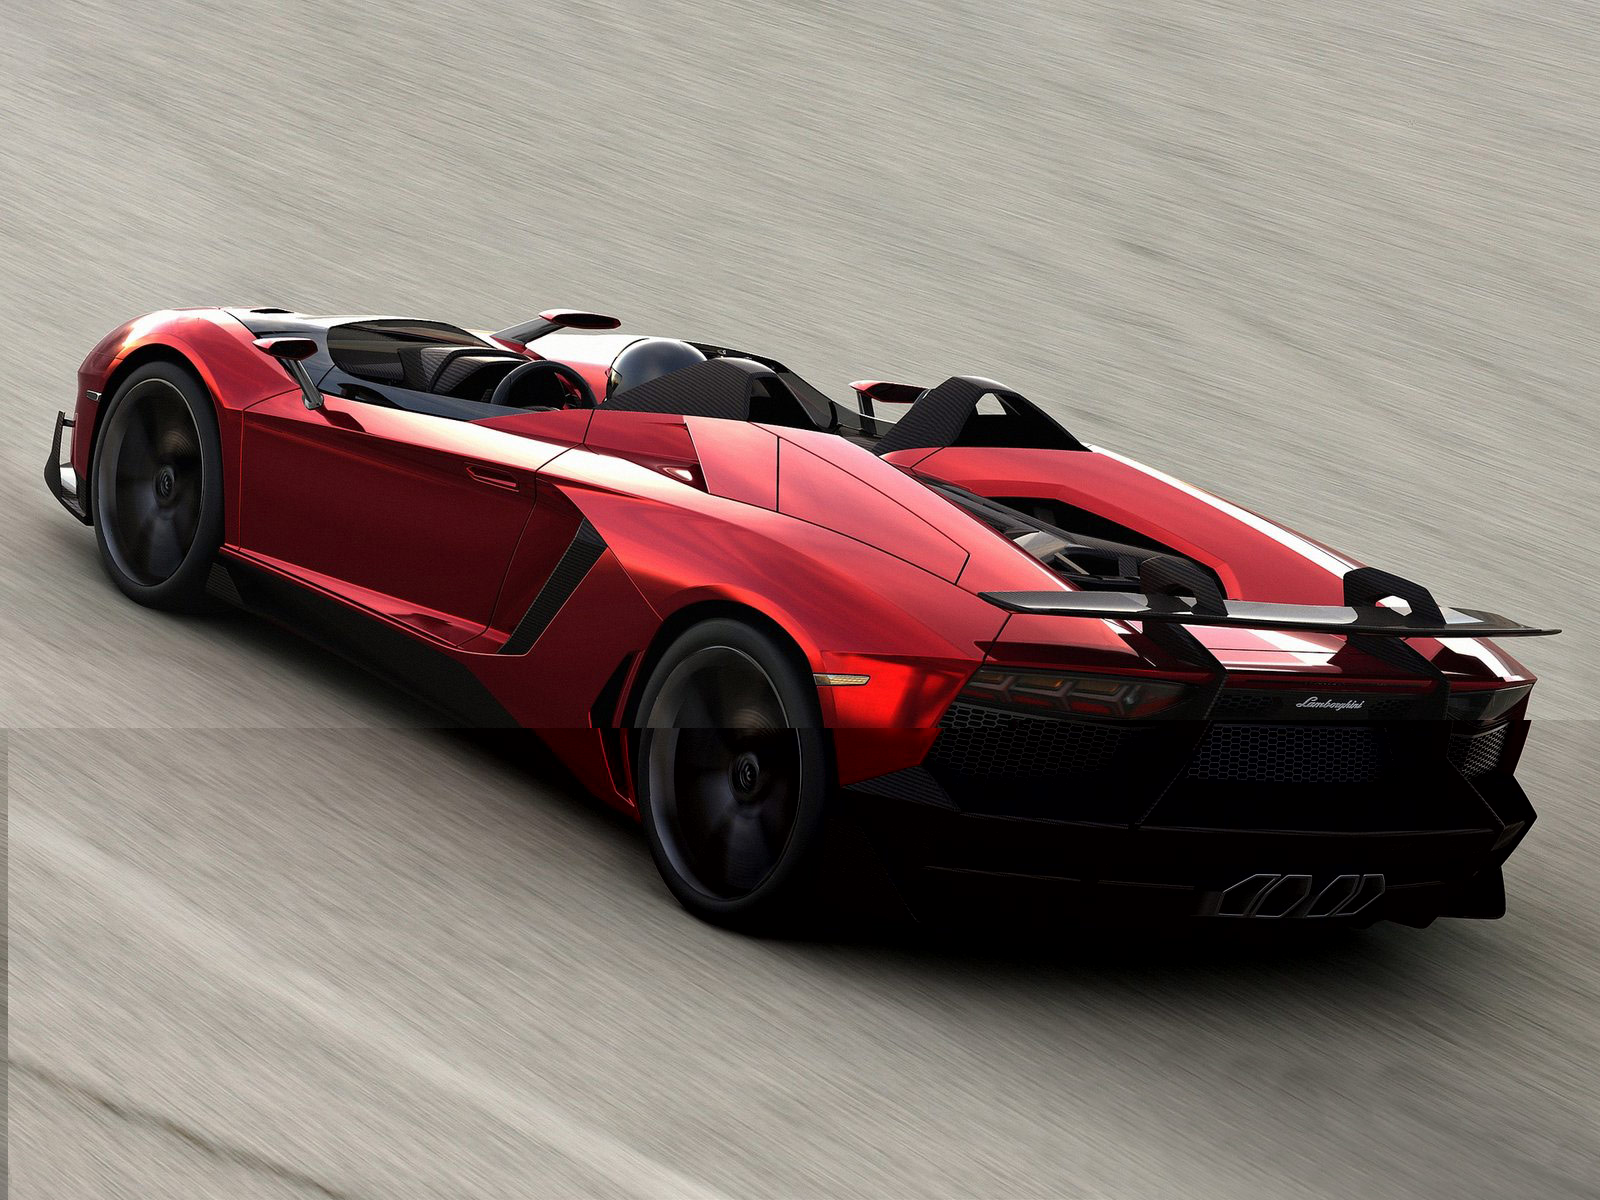 2012 Lamborghini Aventador J Concept | autorecent